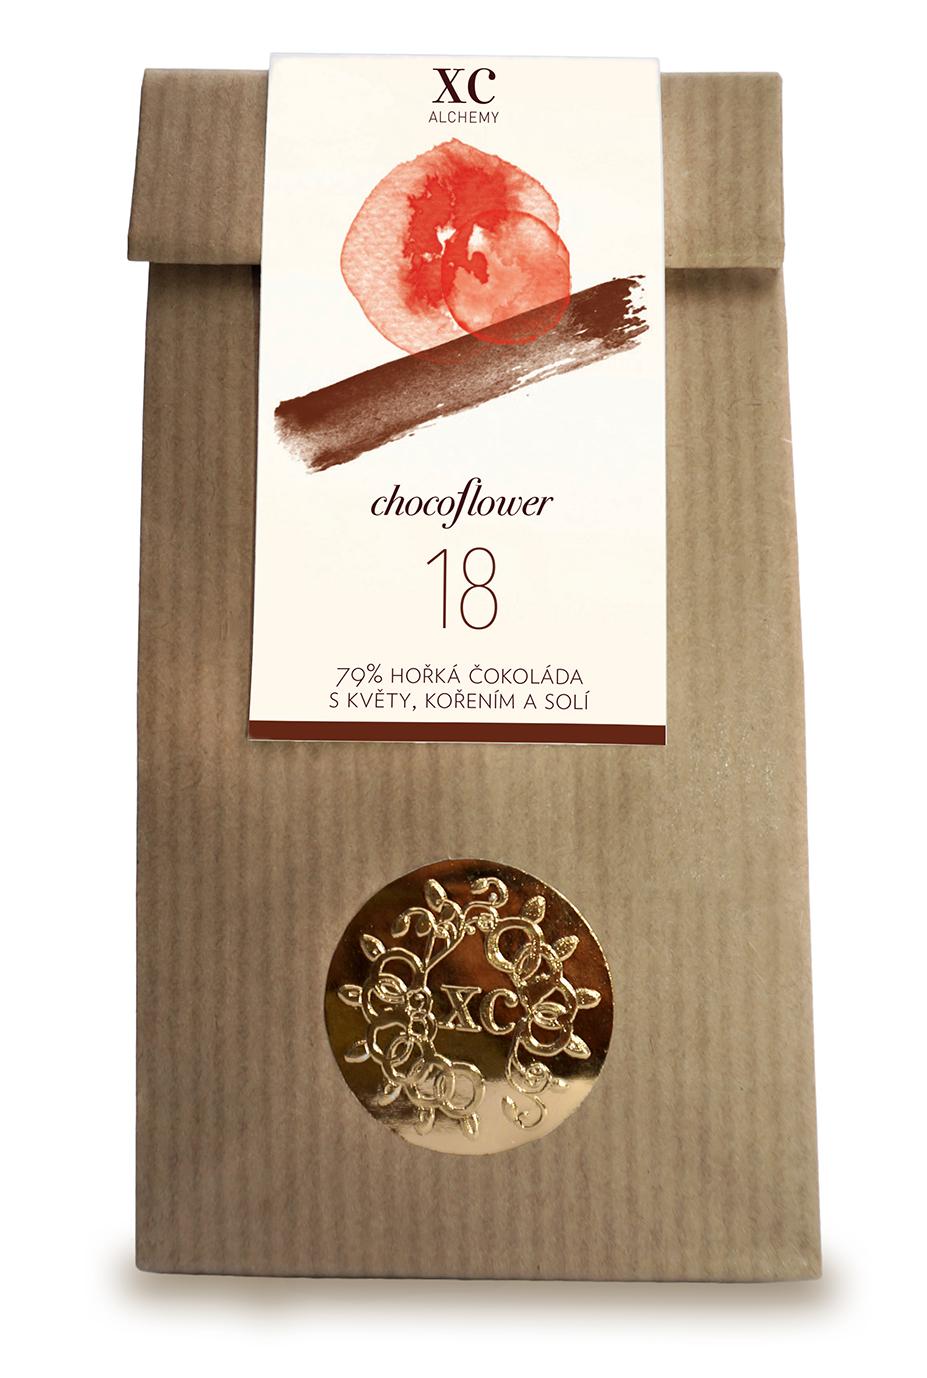 xc chocoflower 18 pho L